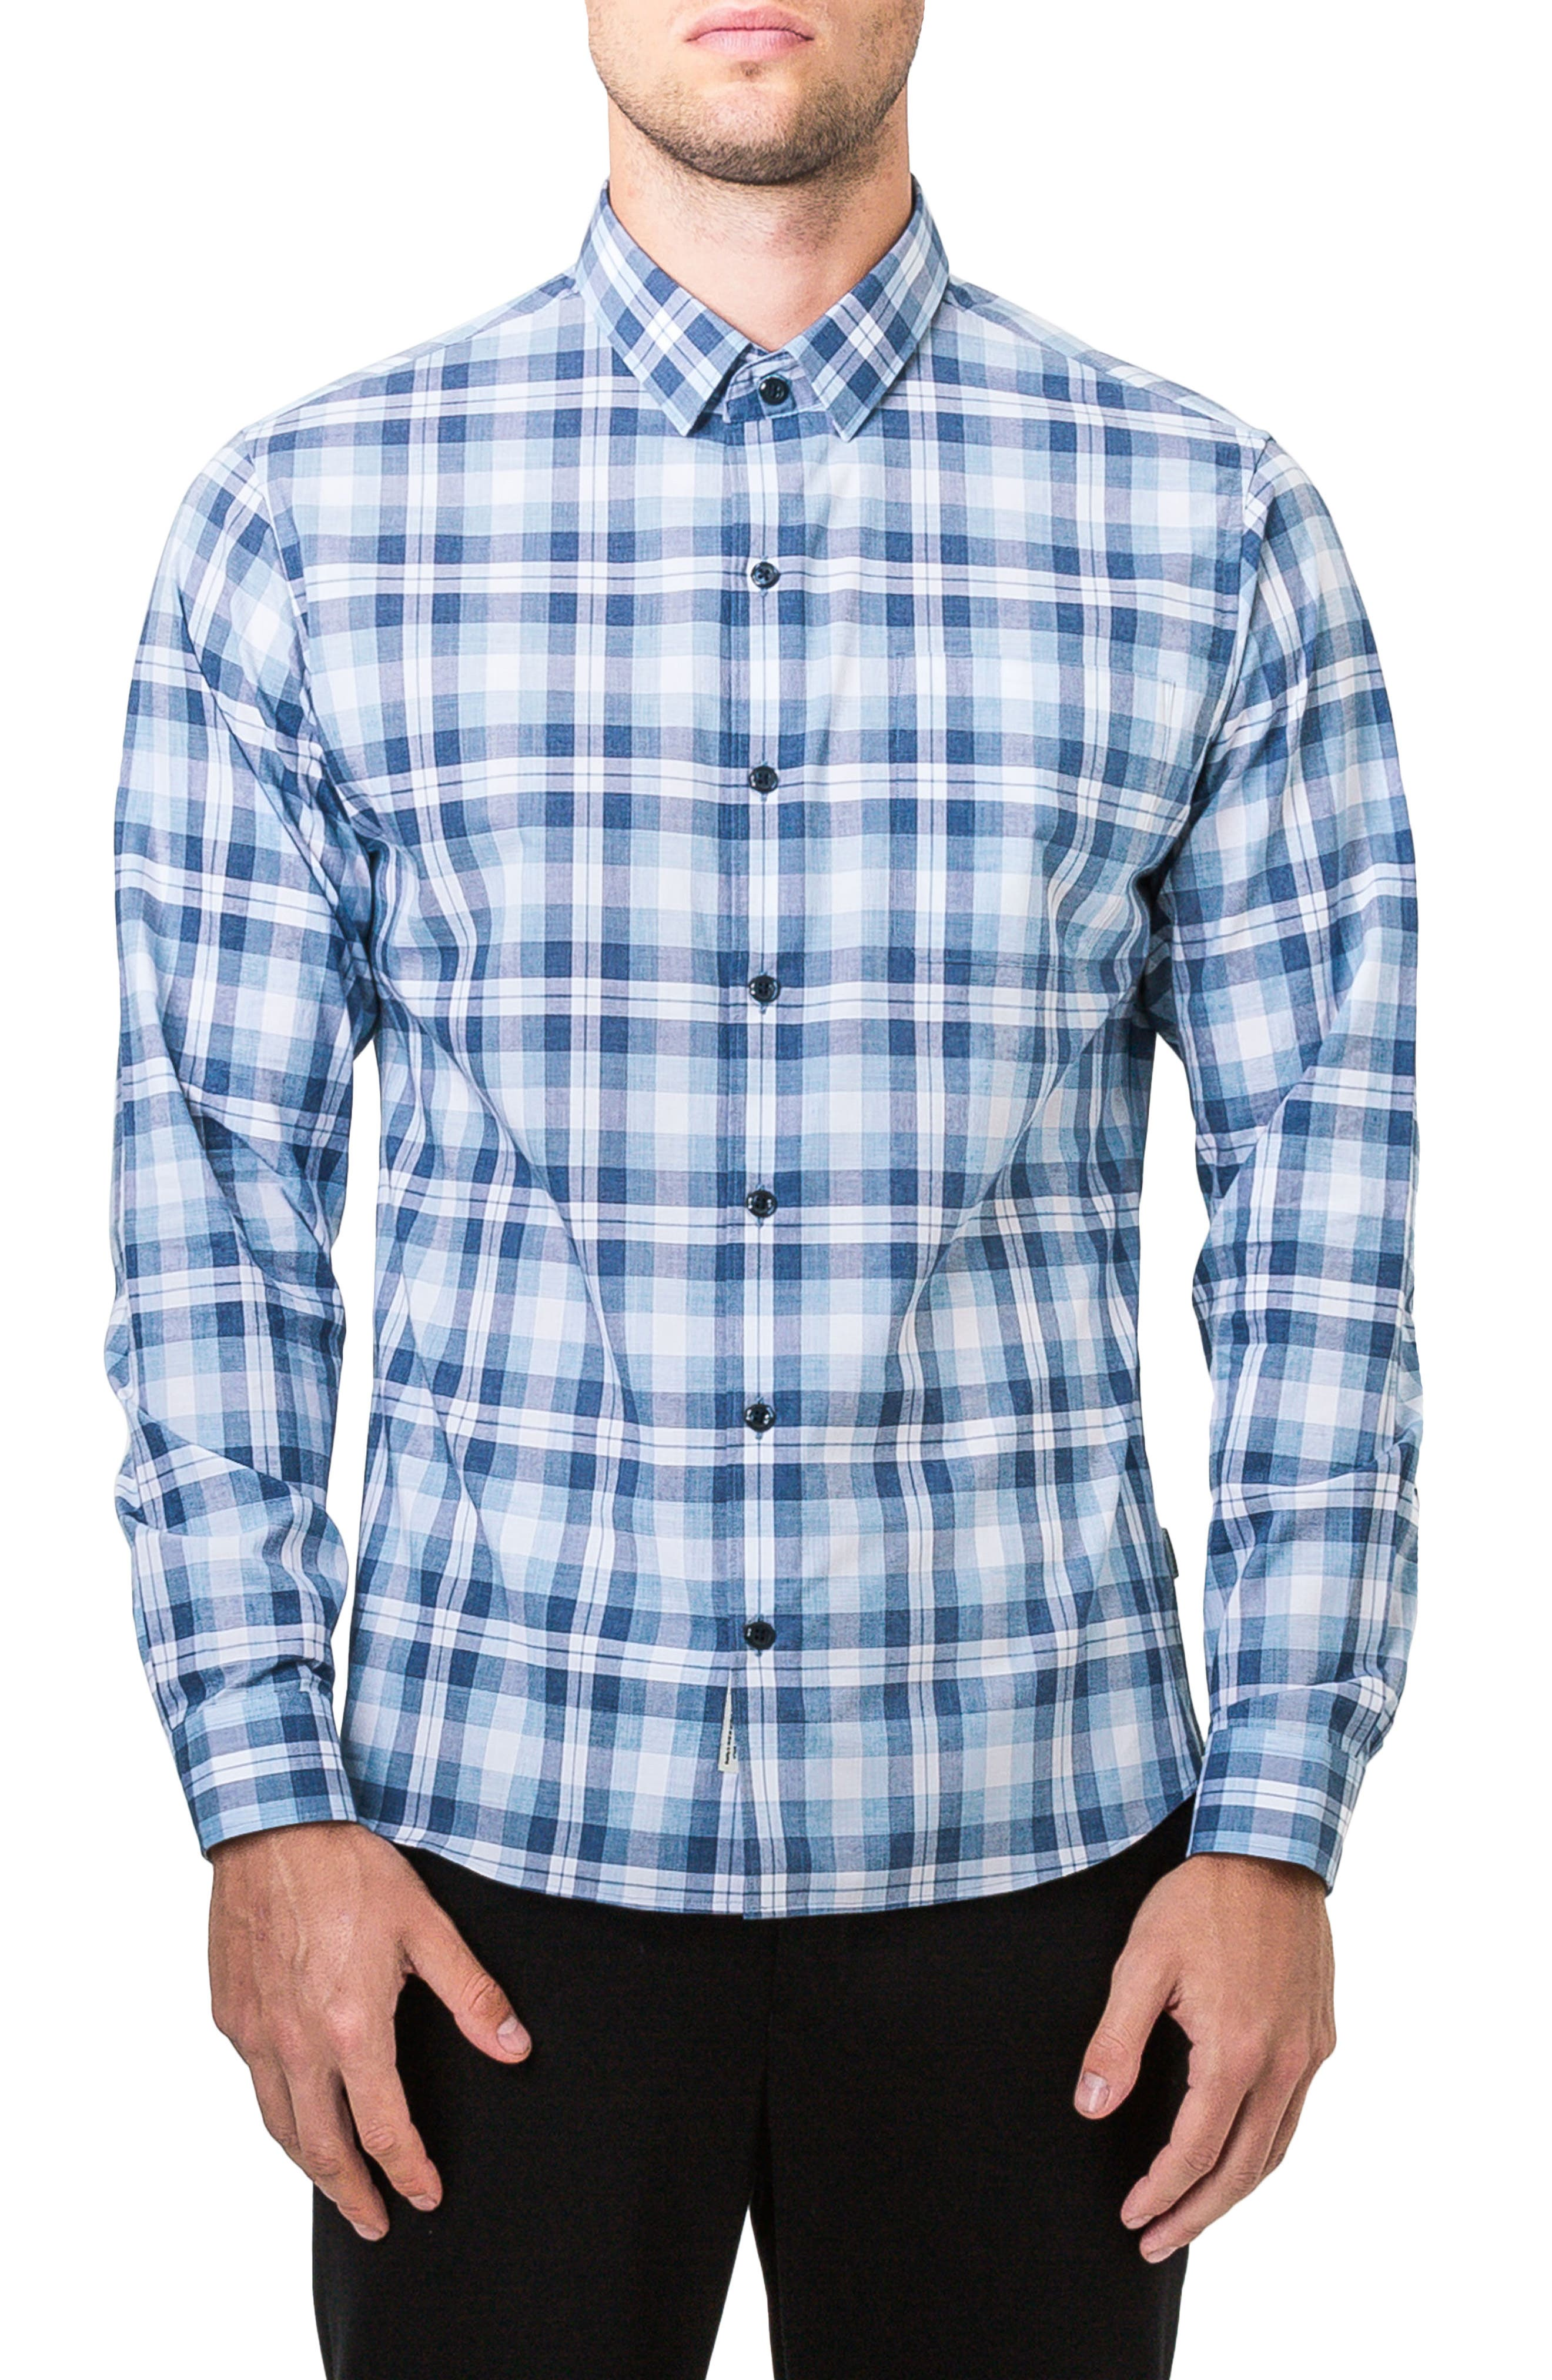 Morning Rain Woven Shirt,                         Main,                         color,